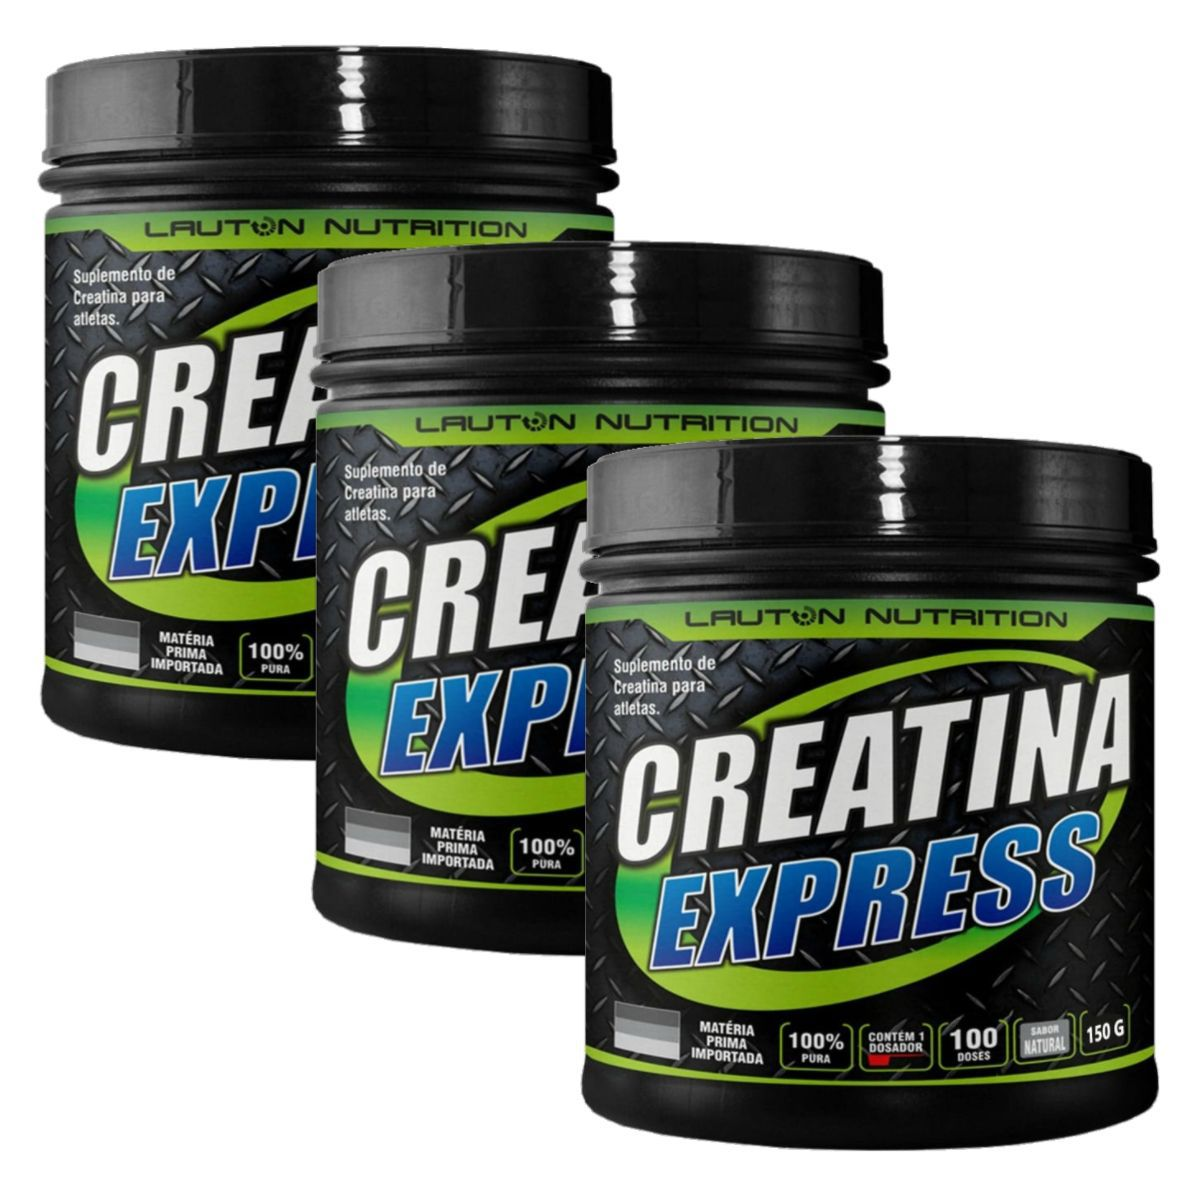 Kit 3 Creatinas Express 100% Pura 100g - Lauton Nutrition